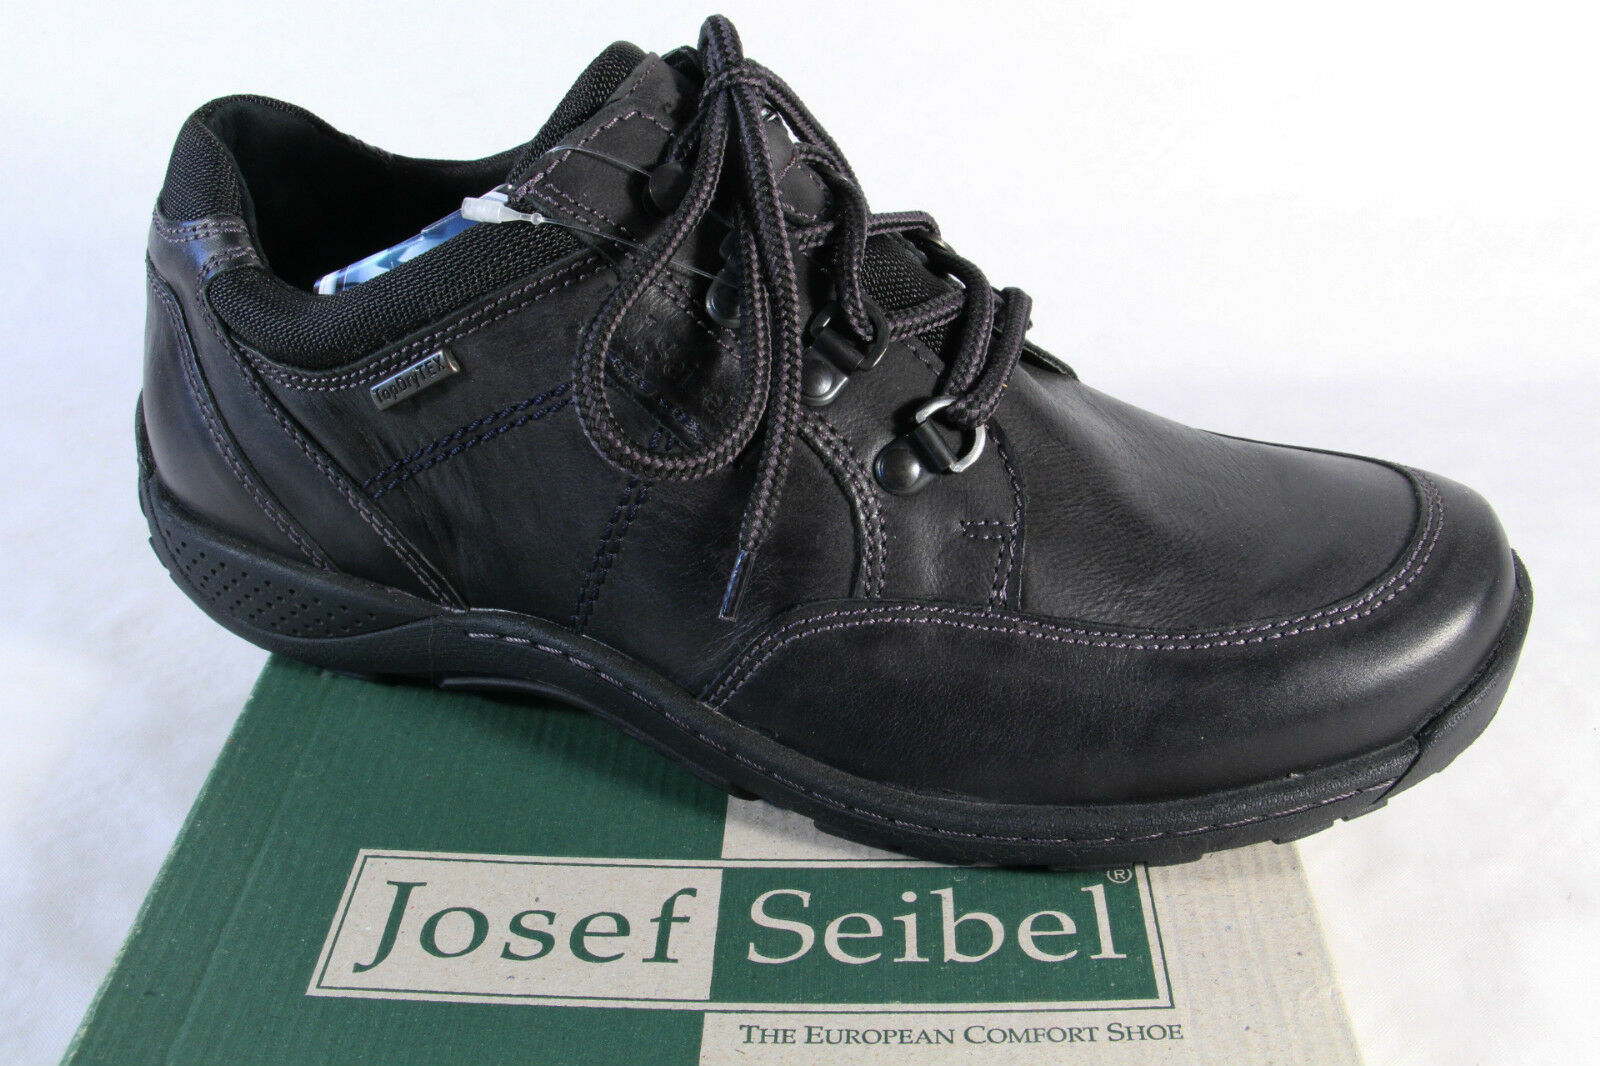 Seibel Halbschuh Herren Schnürschuh, Halbschuh Seibel Turnschuhe schwarz, Lederinnensohle, NEU  cc316e